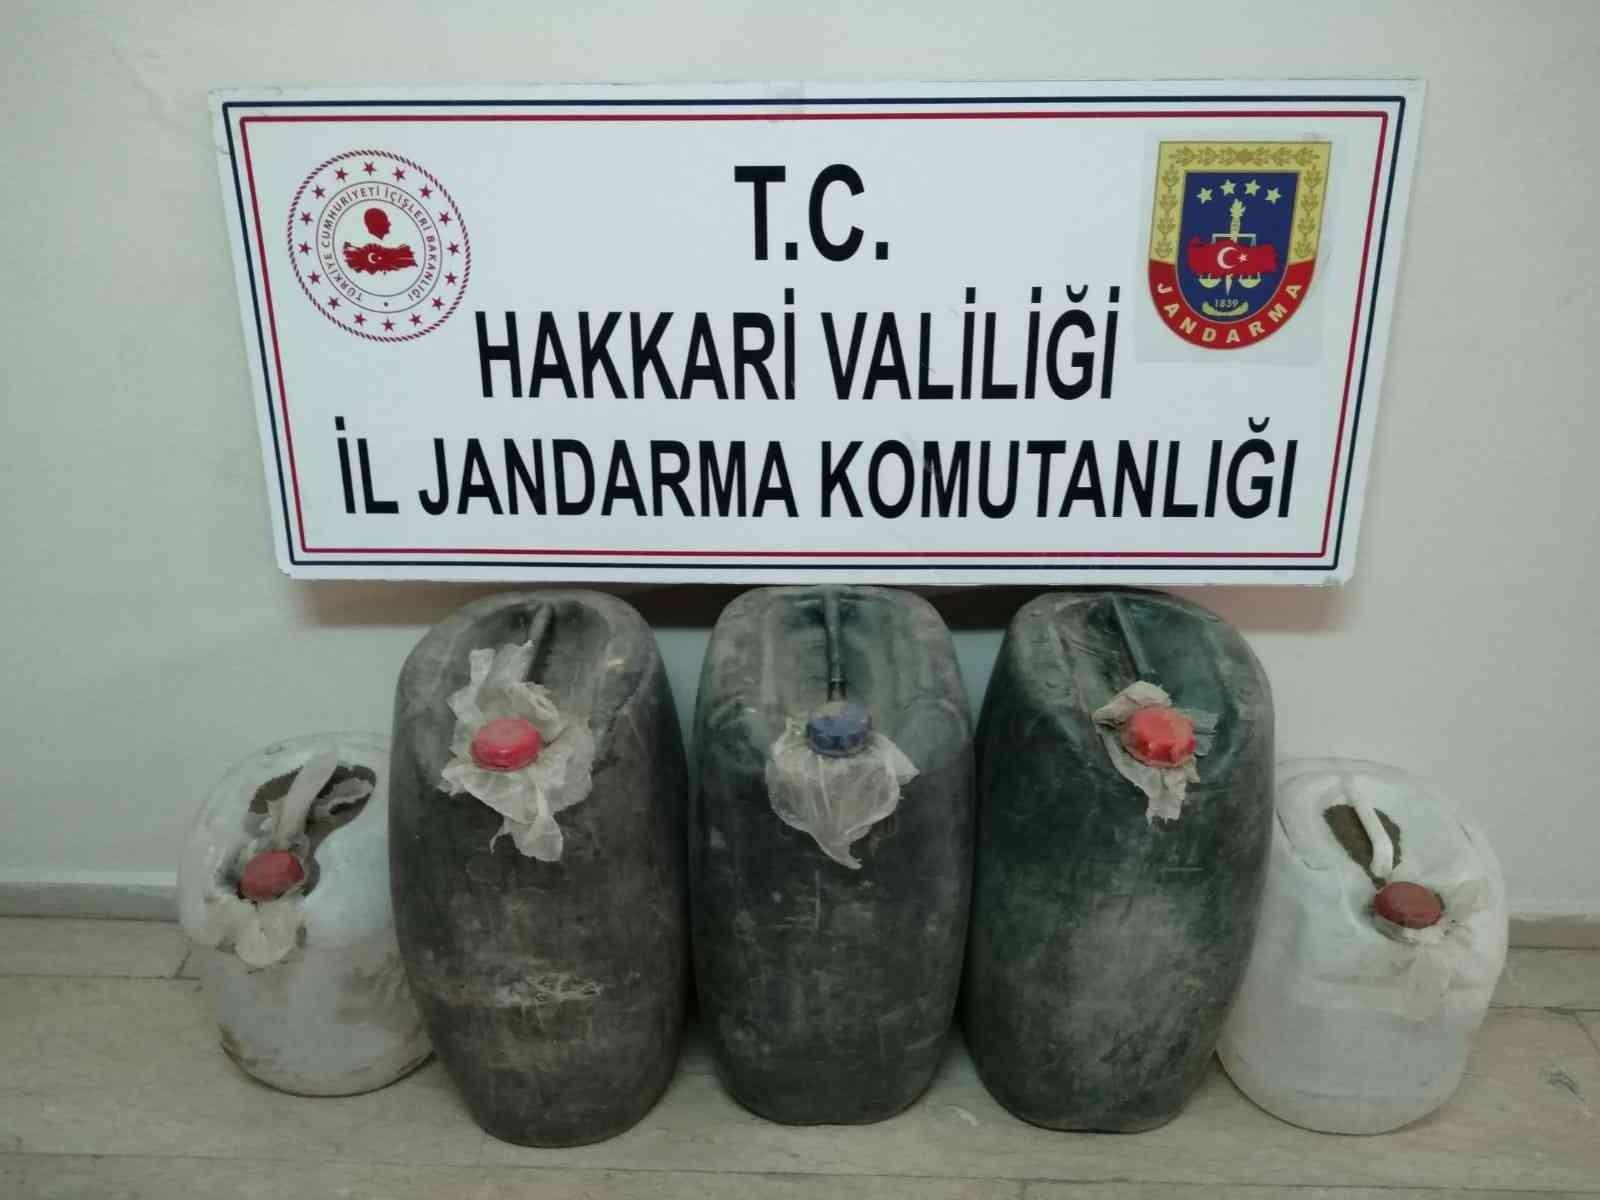 Yüksekova kırsalında 200 litre asit anhidrit maddesi ele geçirildi #hakkari